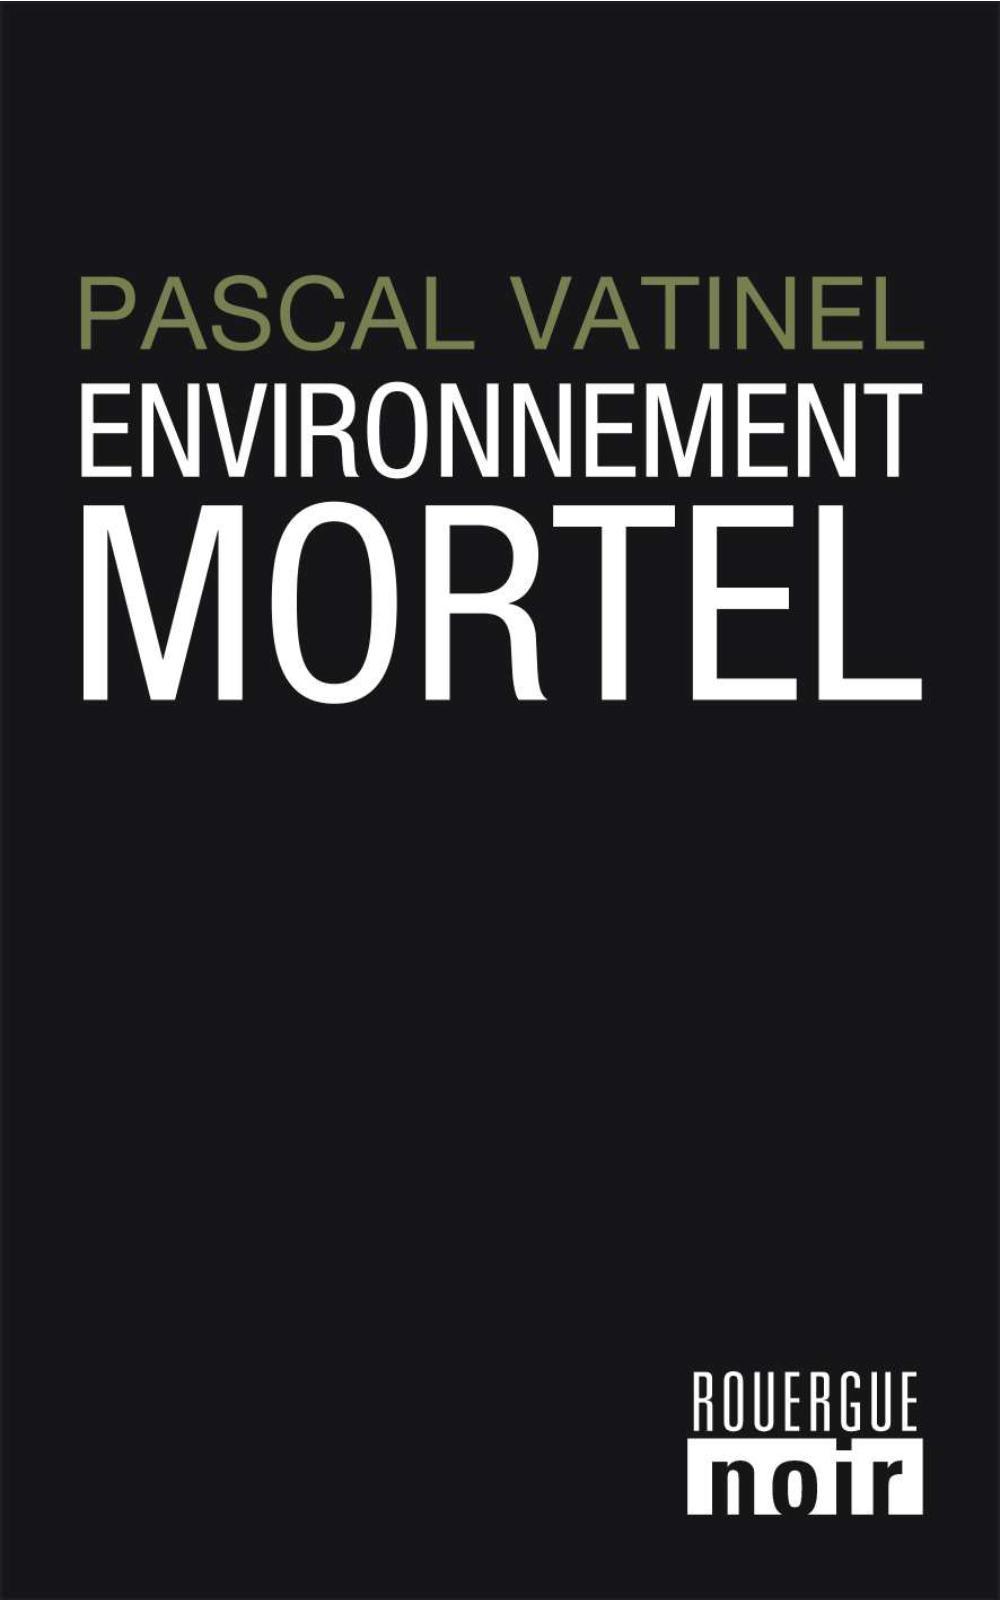 Environnement mortel